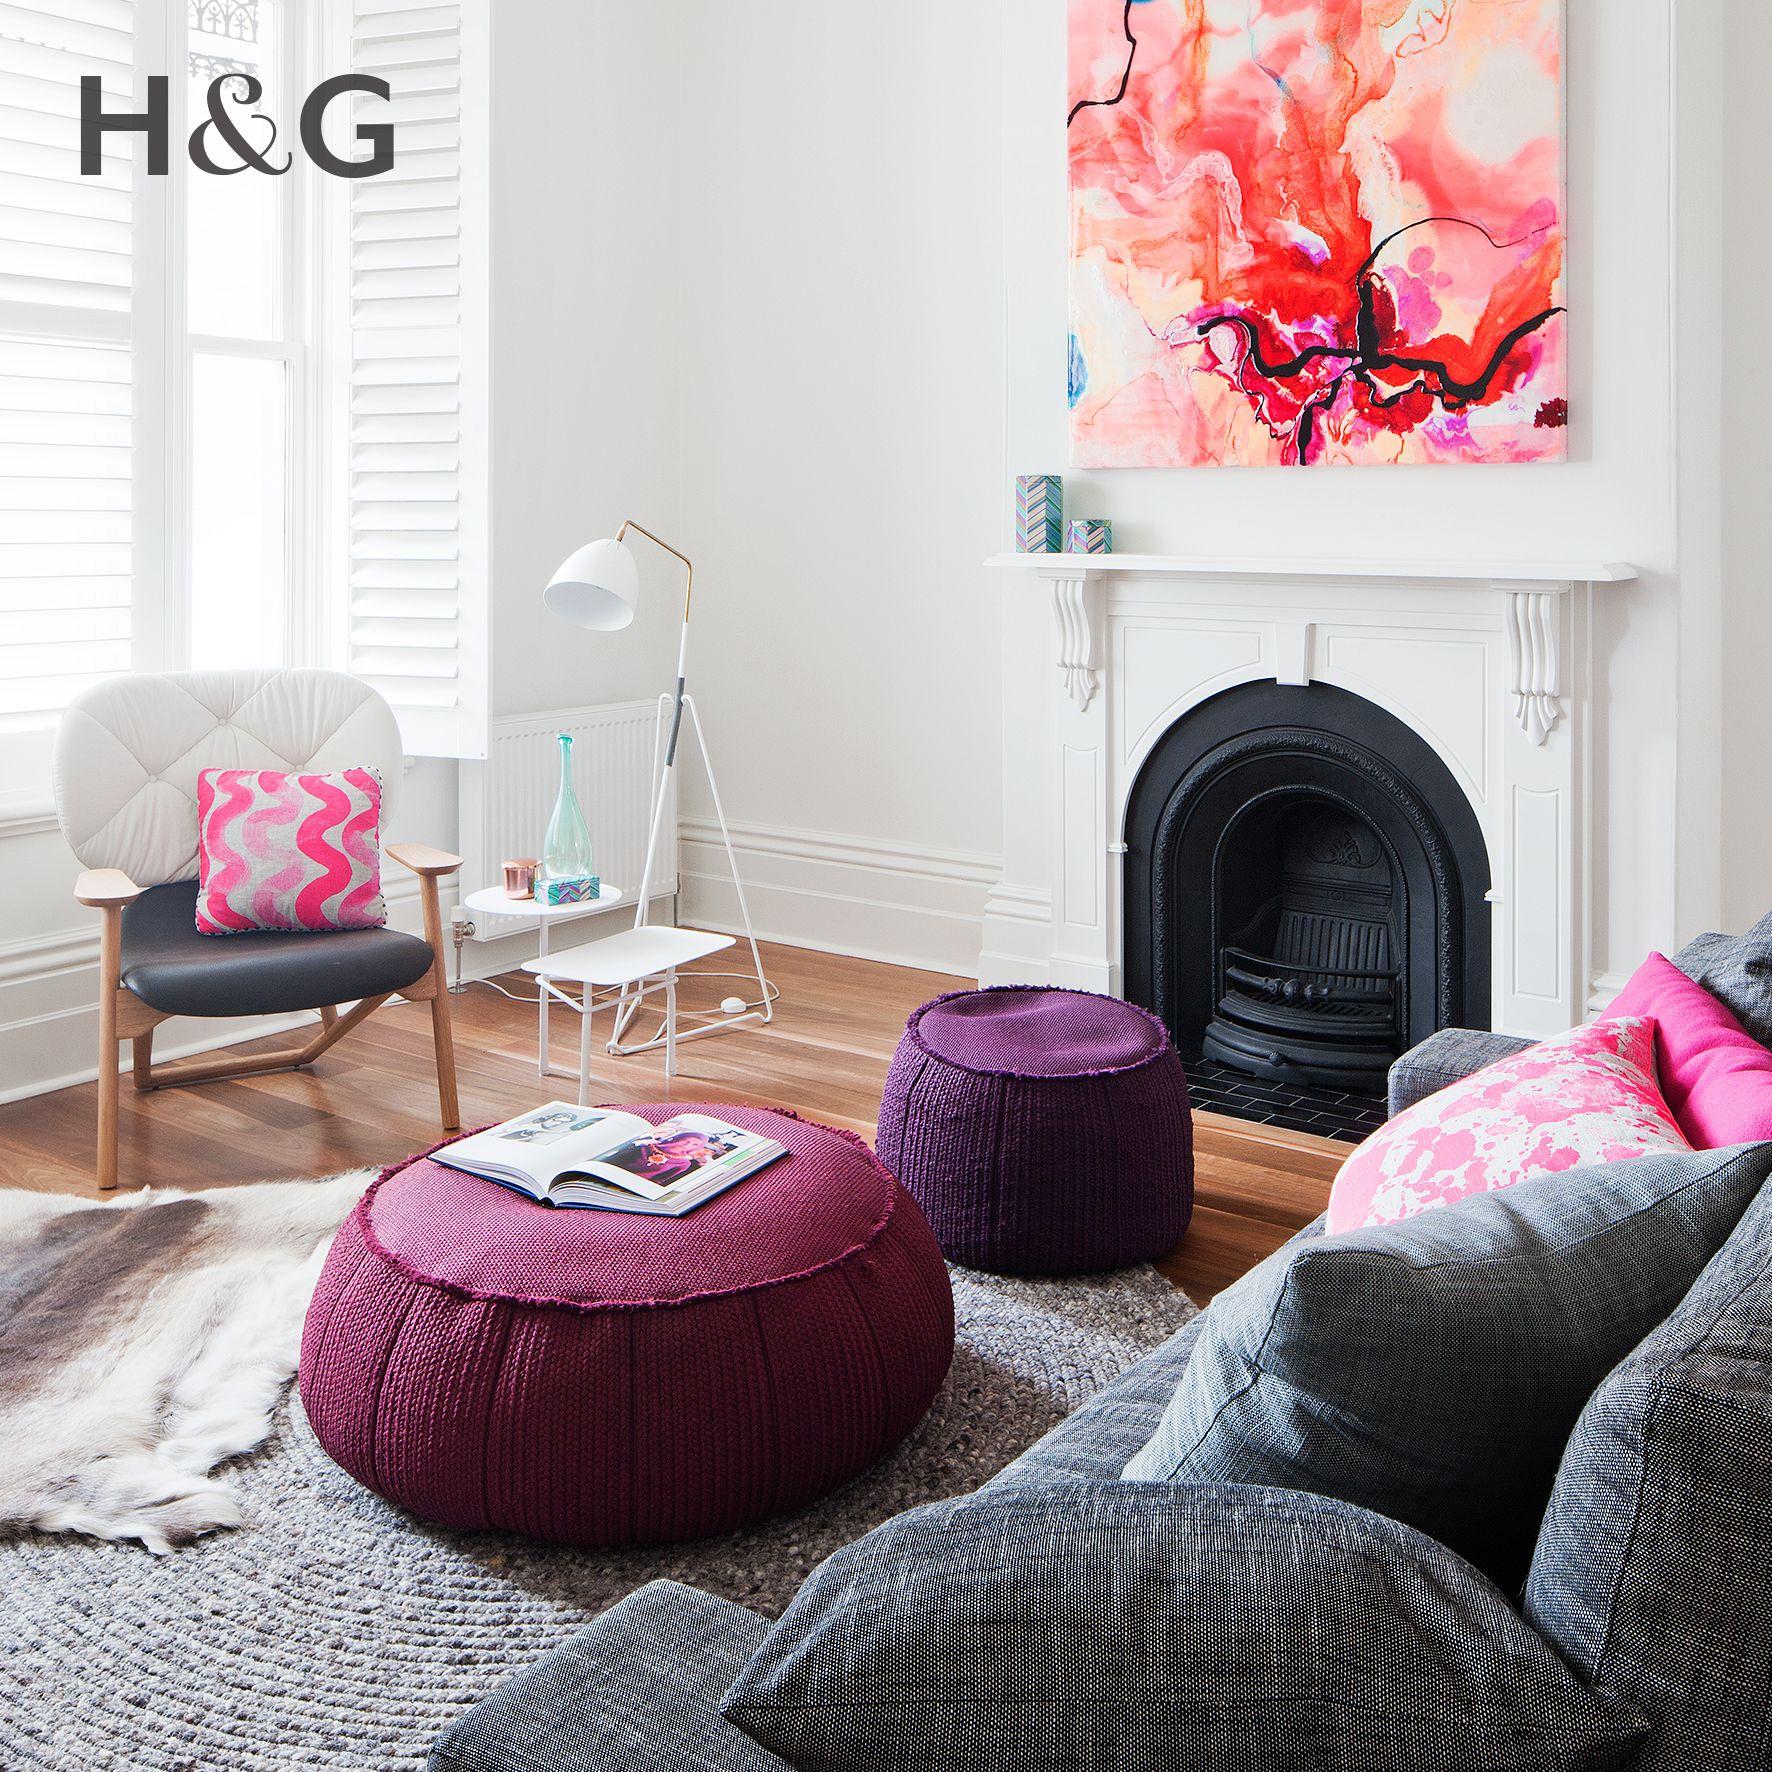 Pink, orange, maroon and purple create an energetic vibe in this ...